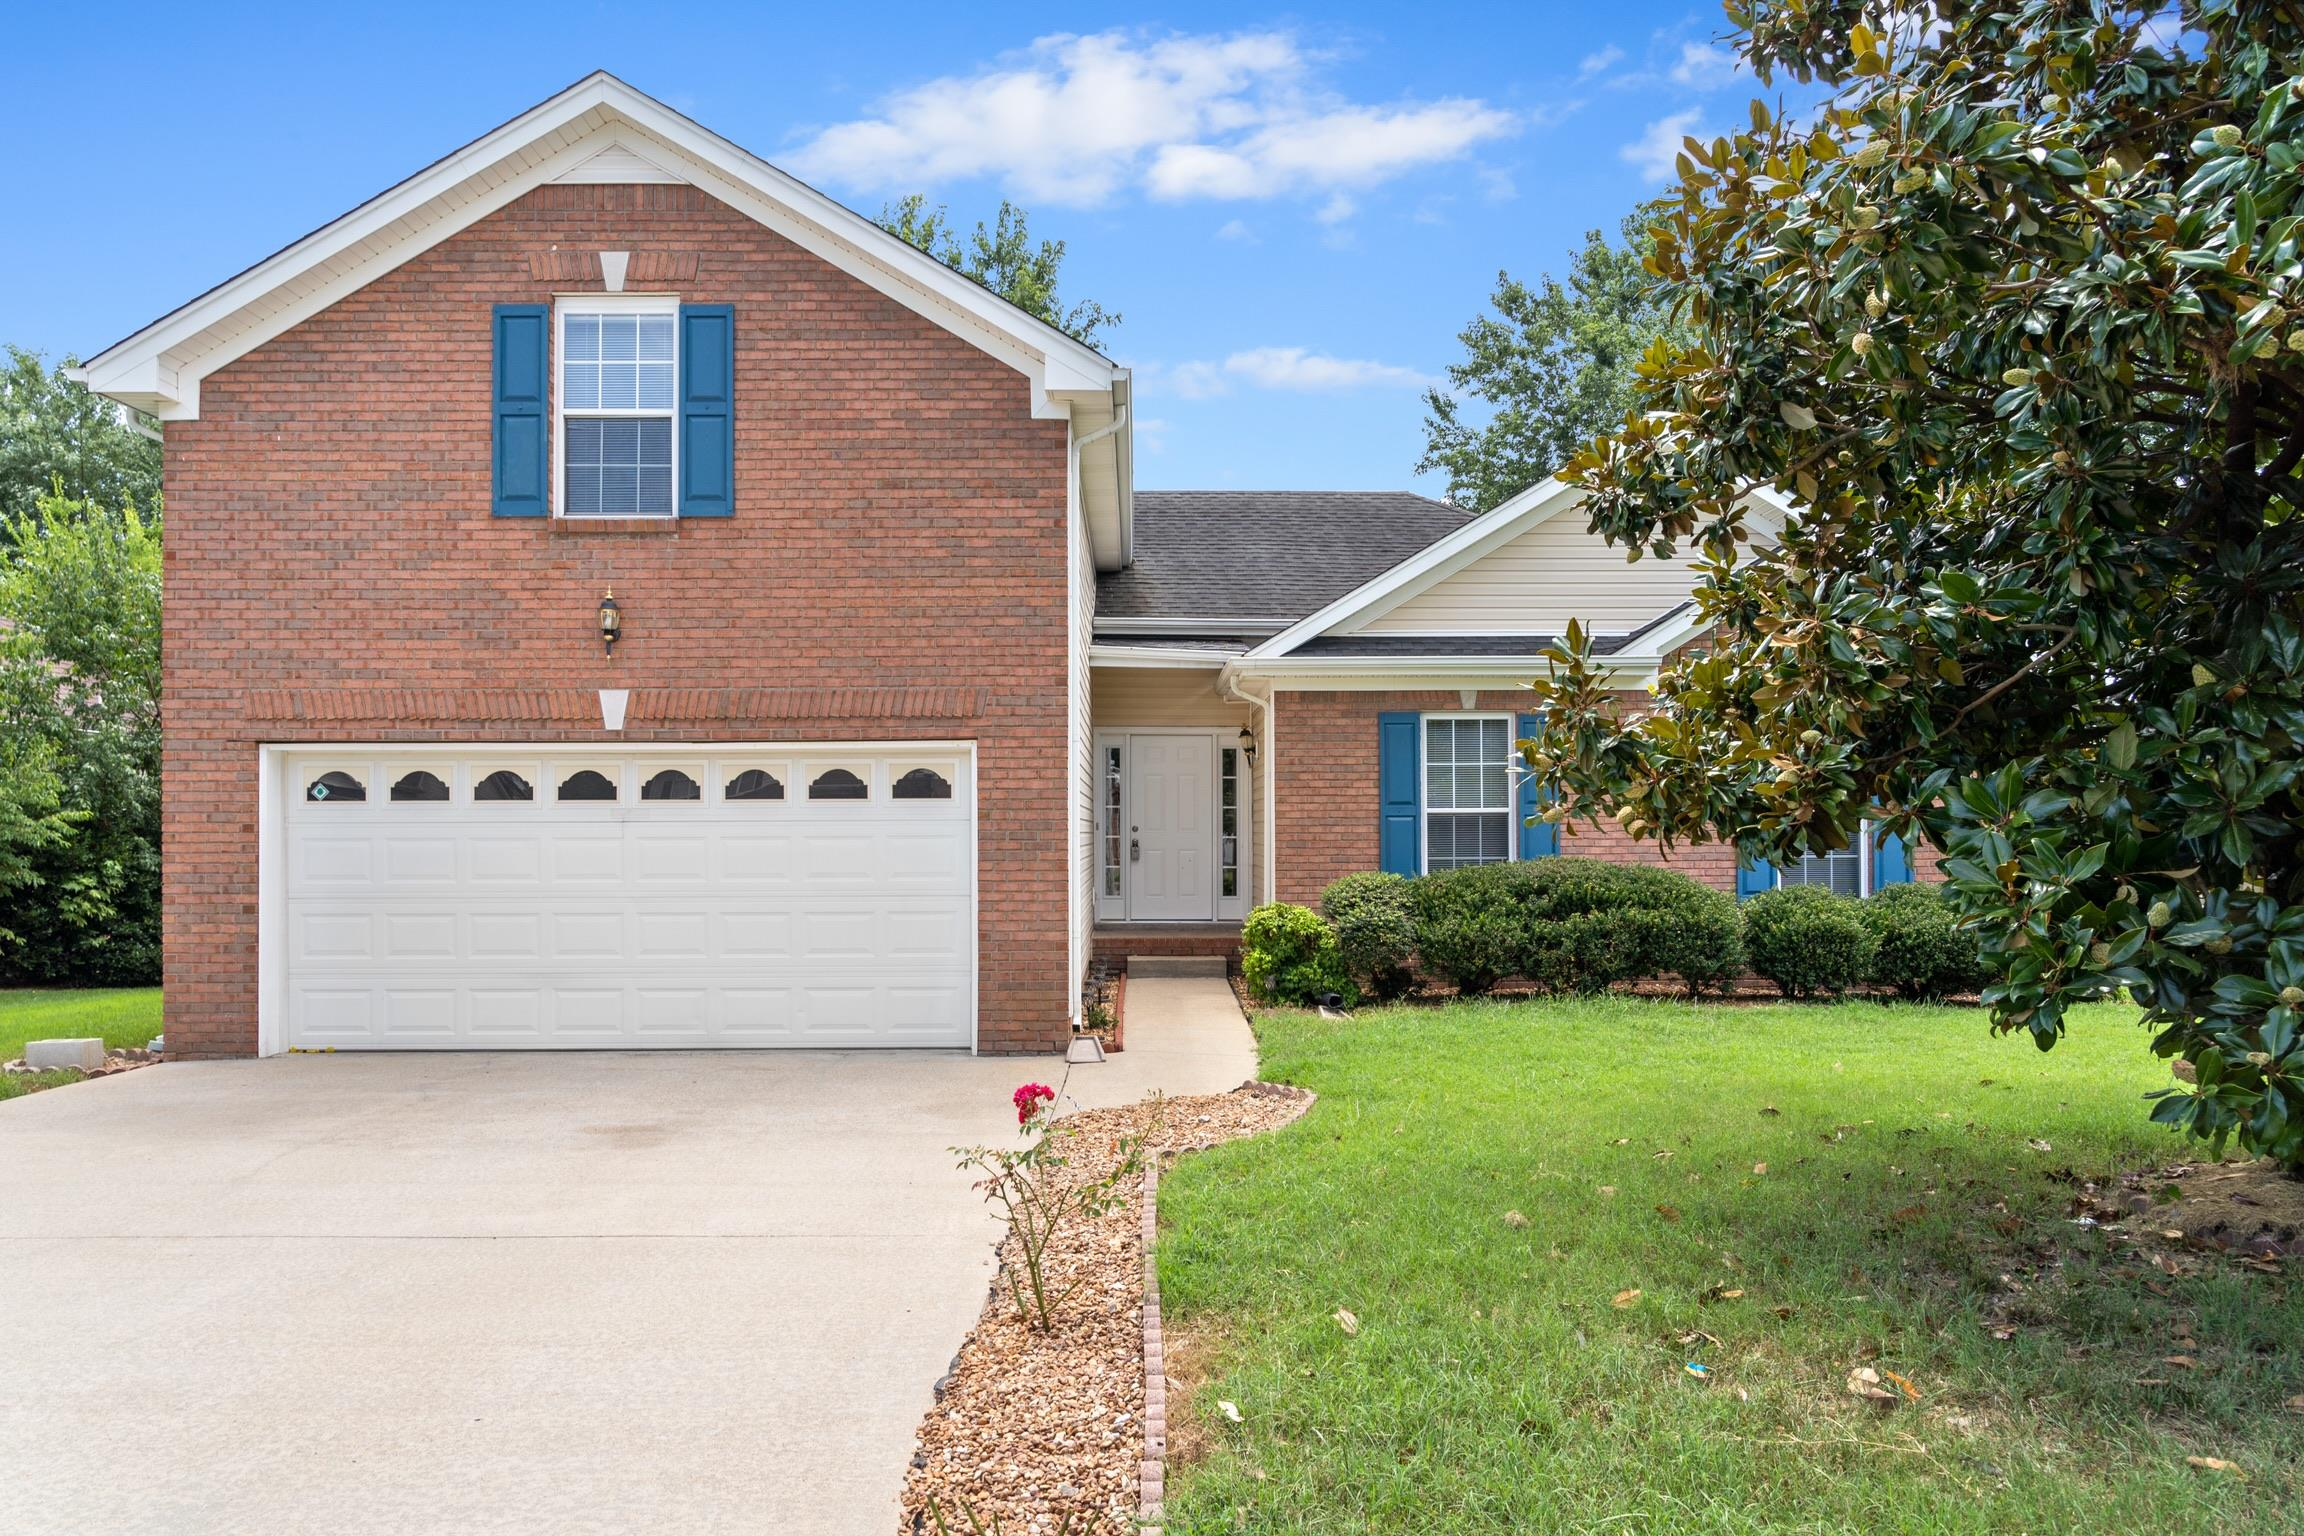 1180 Connemara Way, Clarksville, TN 37040 - Clarksville, TN real estate listing